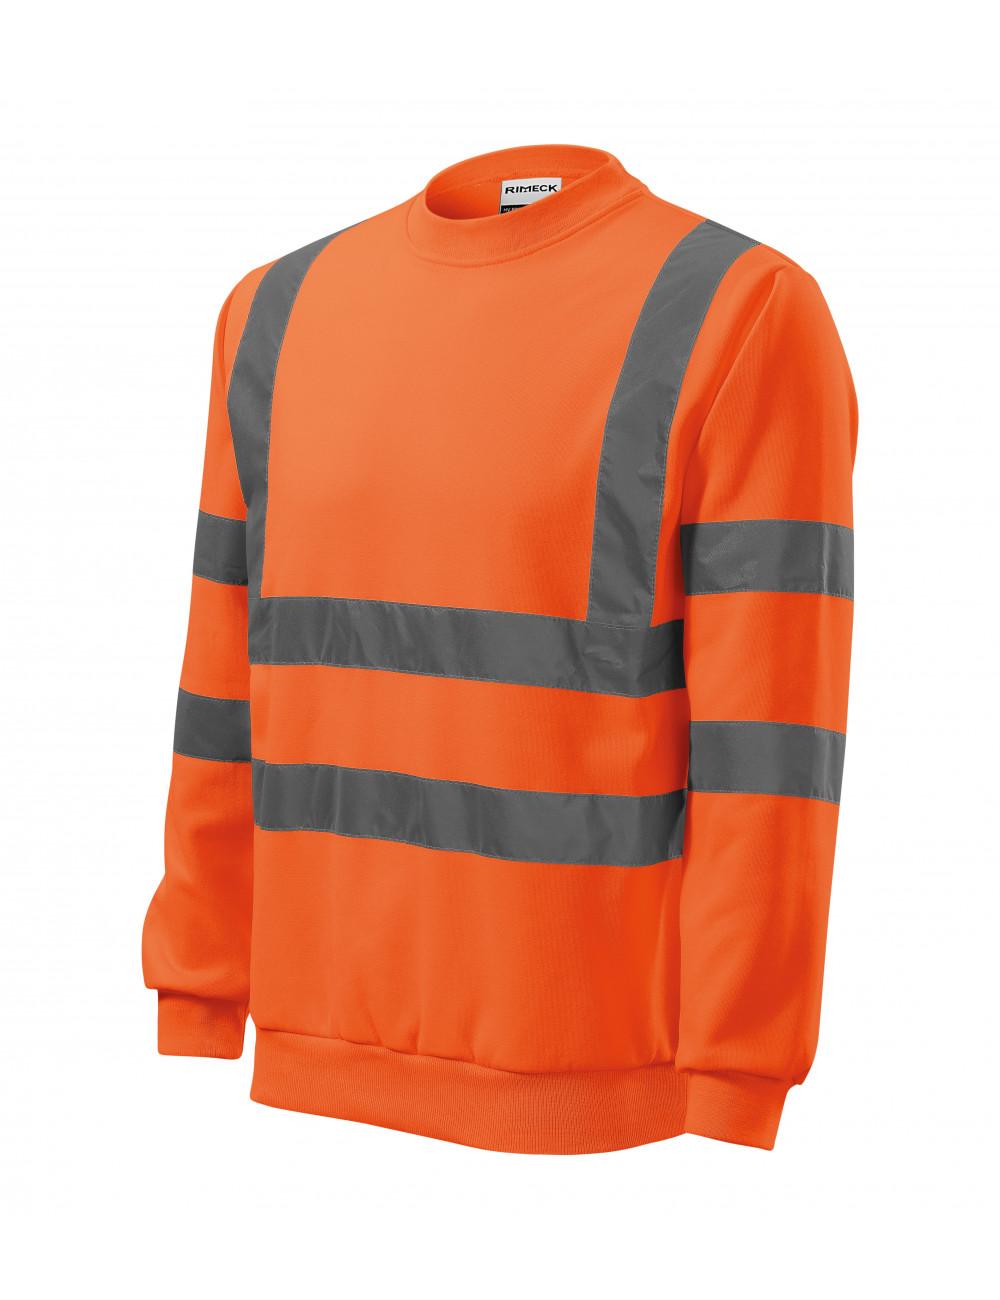 Adler RIMECK Bluza unisex HV Essential 4V6 odblaskowo pomarańczowy